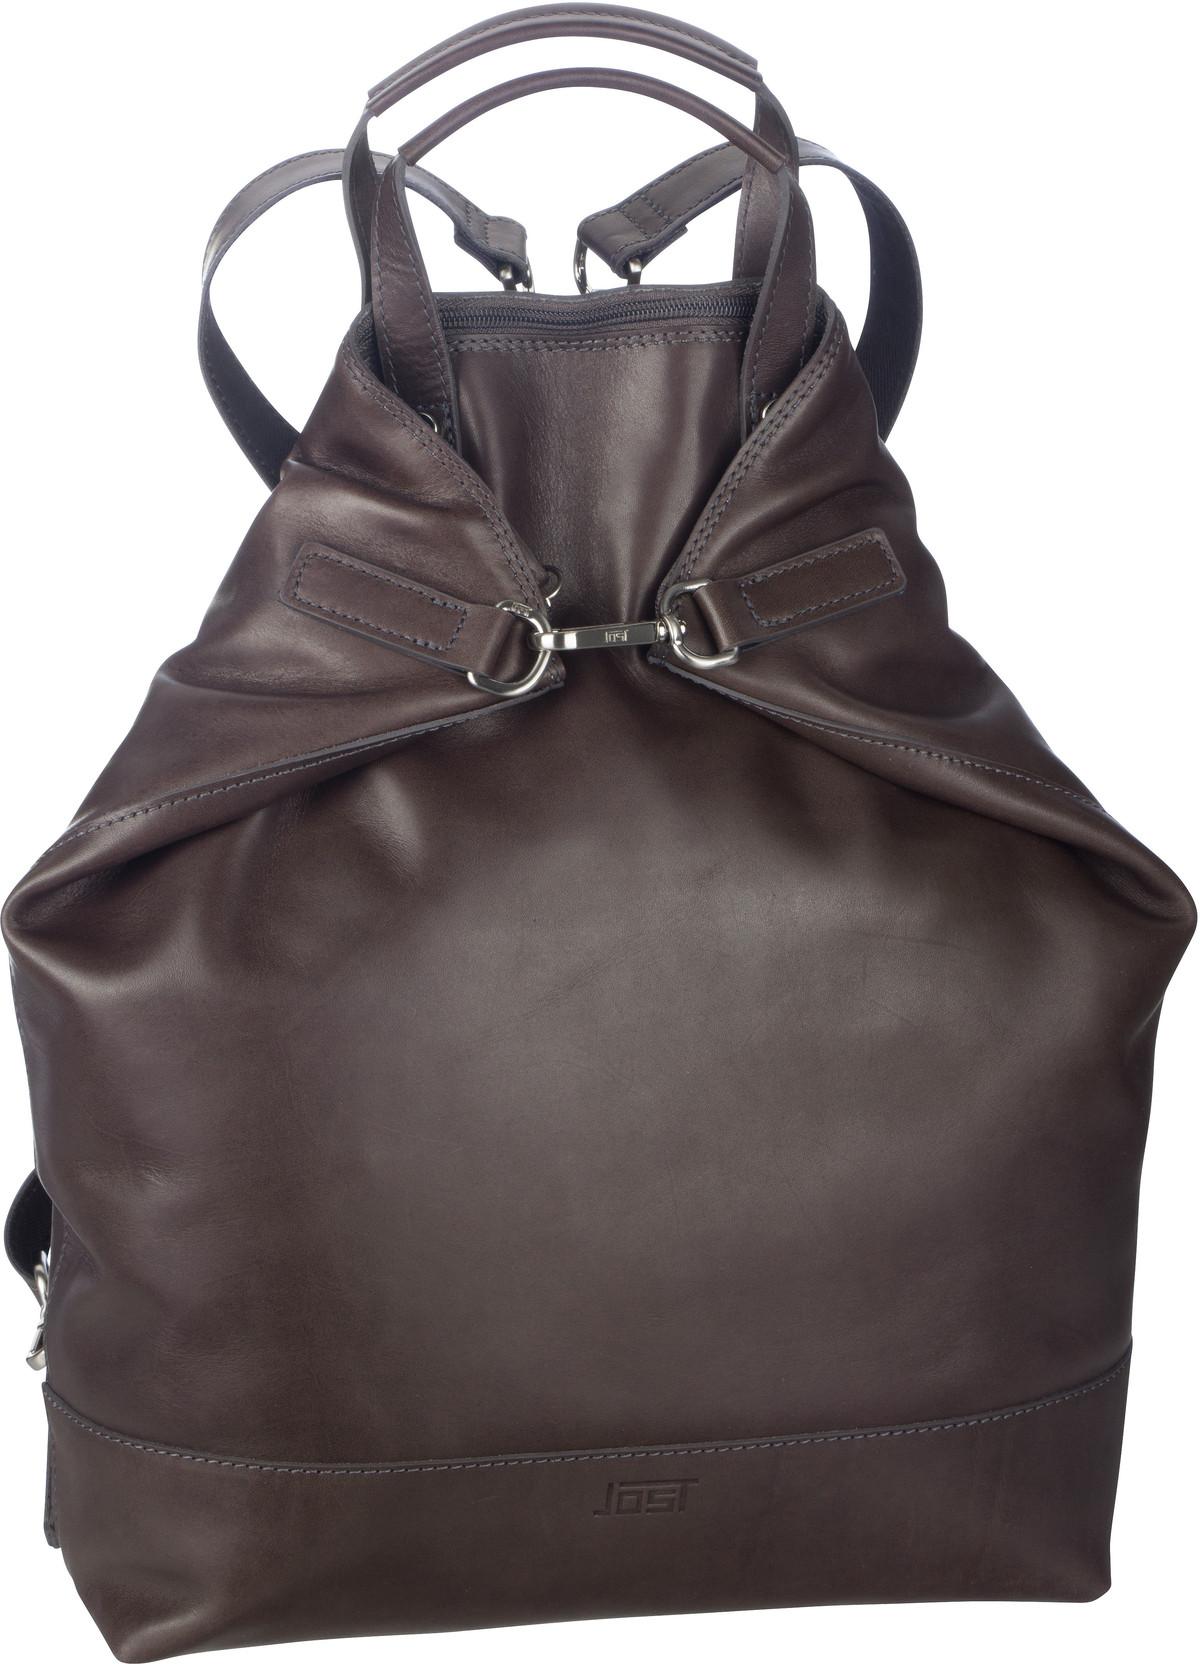 Rucksack / Daypack Rana 1207 X-Change 3in1 Bag S Grey